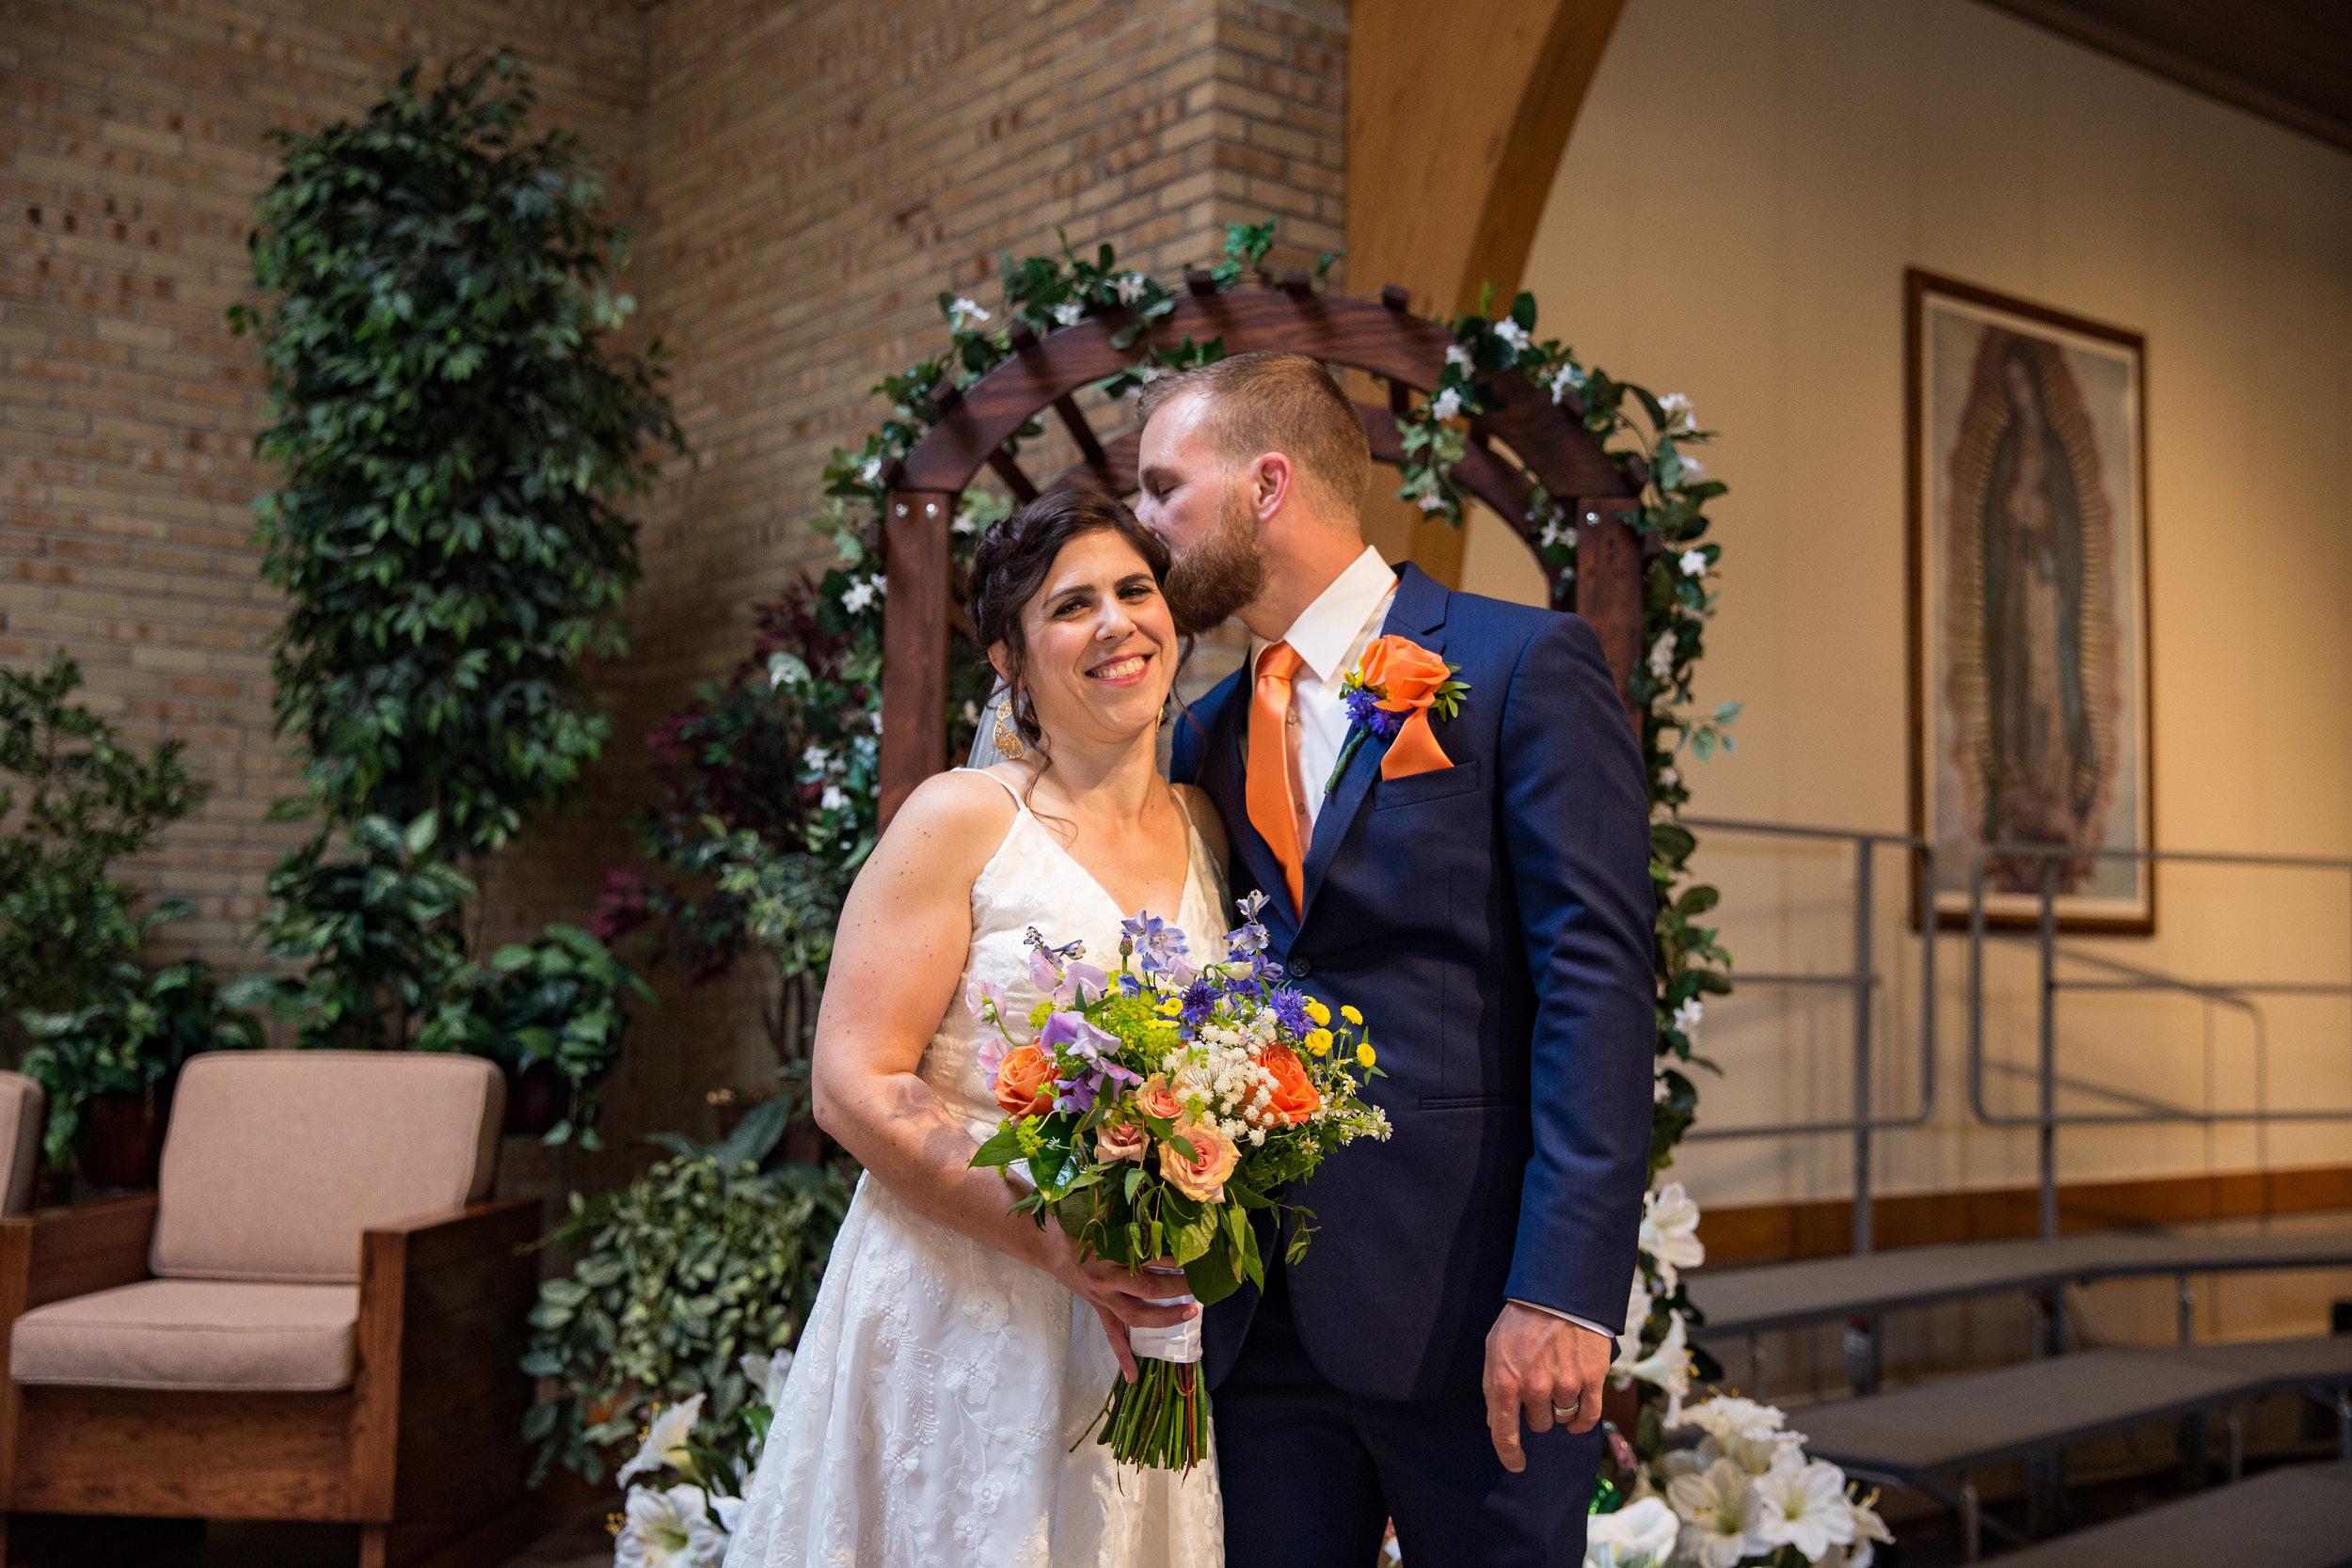 Natalie and Dallas Mooney Wedding 6-8-19_Tania Watt Photography-209.jpg